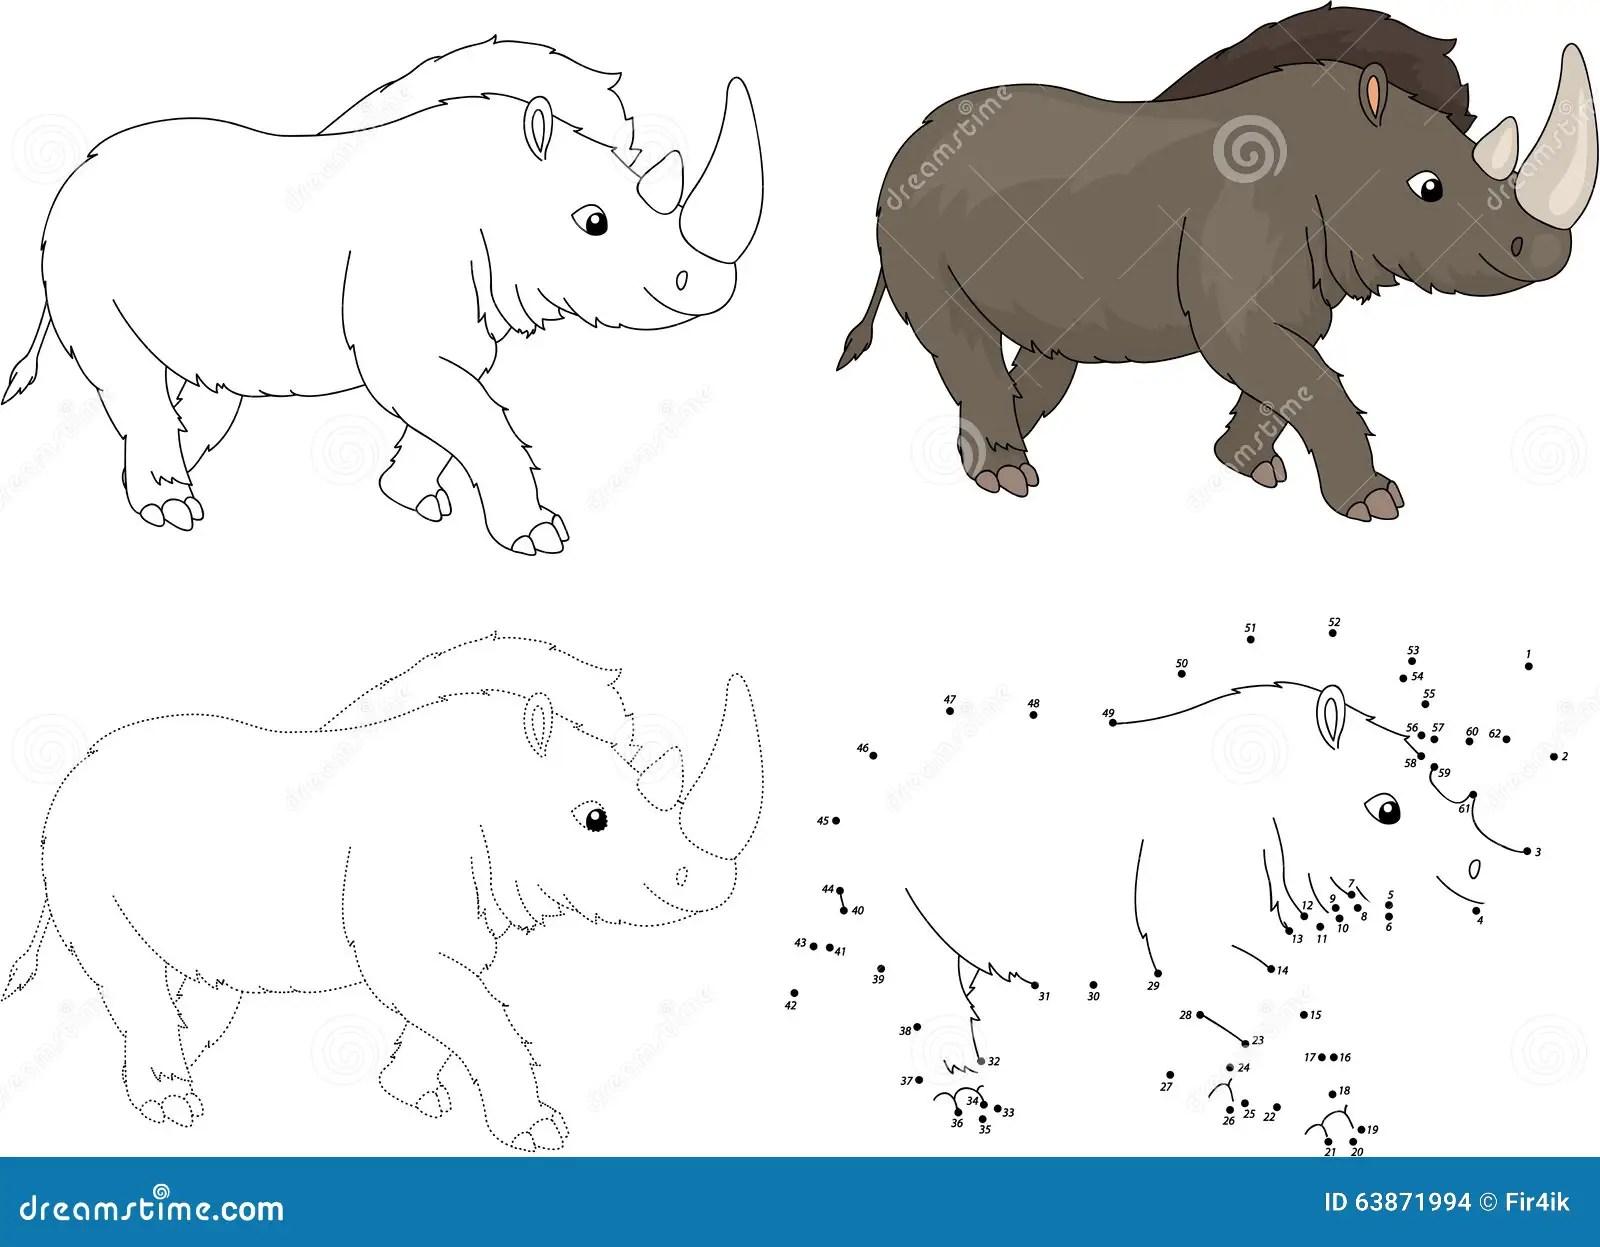 Worksheet Rhino